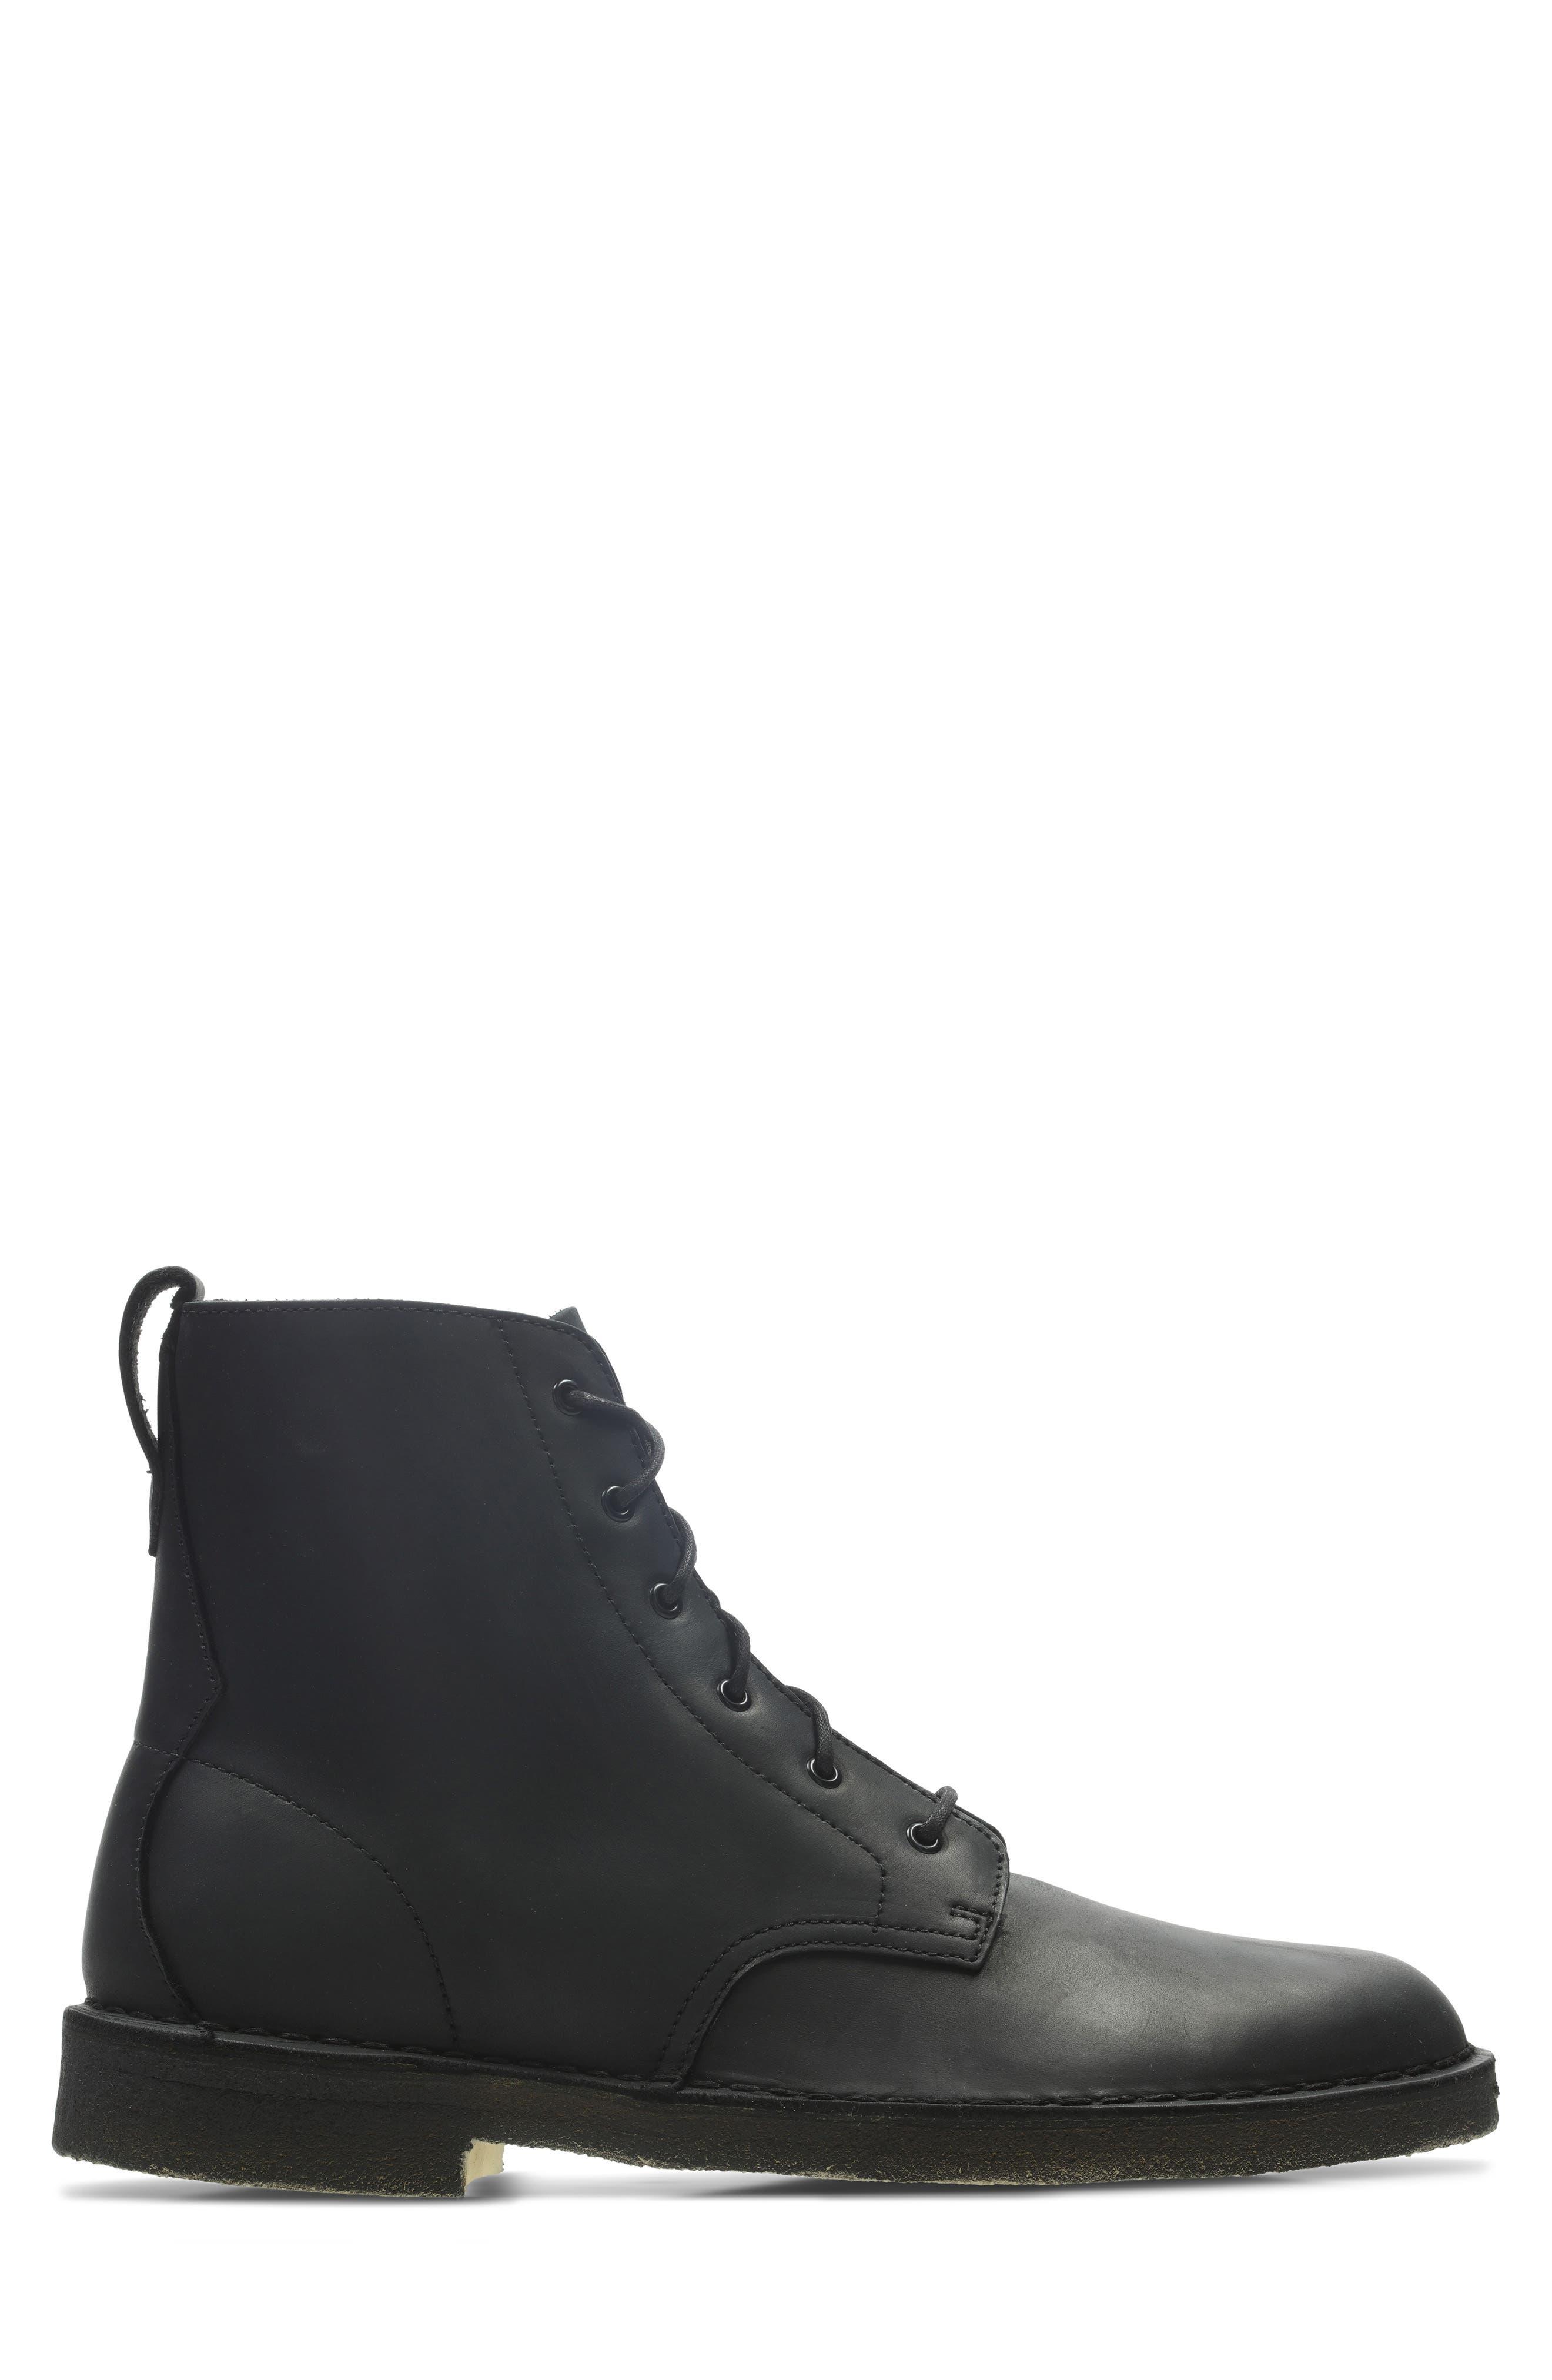 Originals 'Desert Mali' Boot,                             Alternate thumbnail 2, color,                             BLACK LEATHER